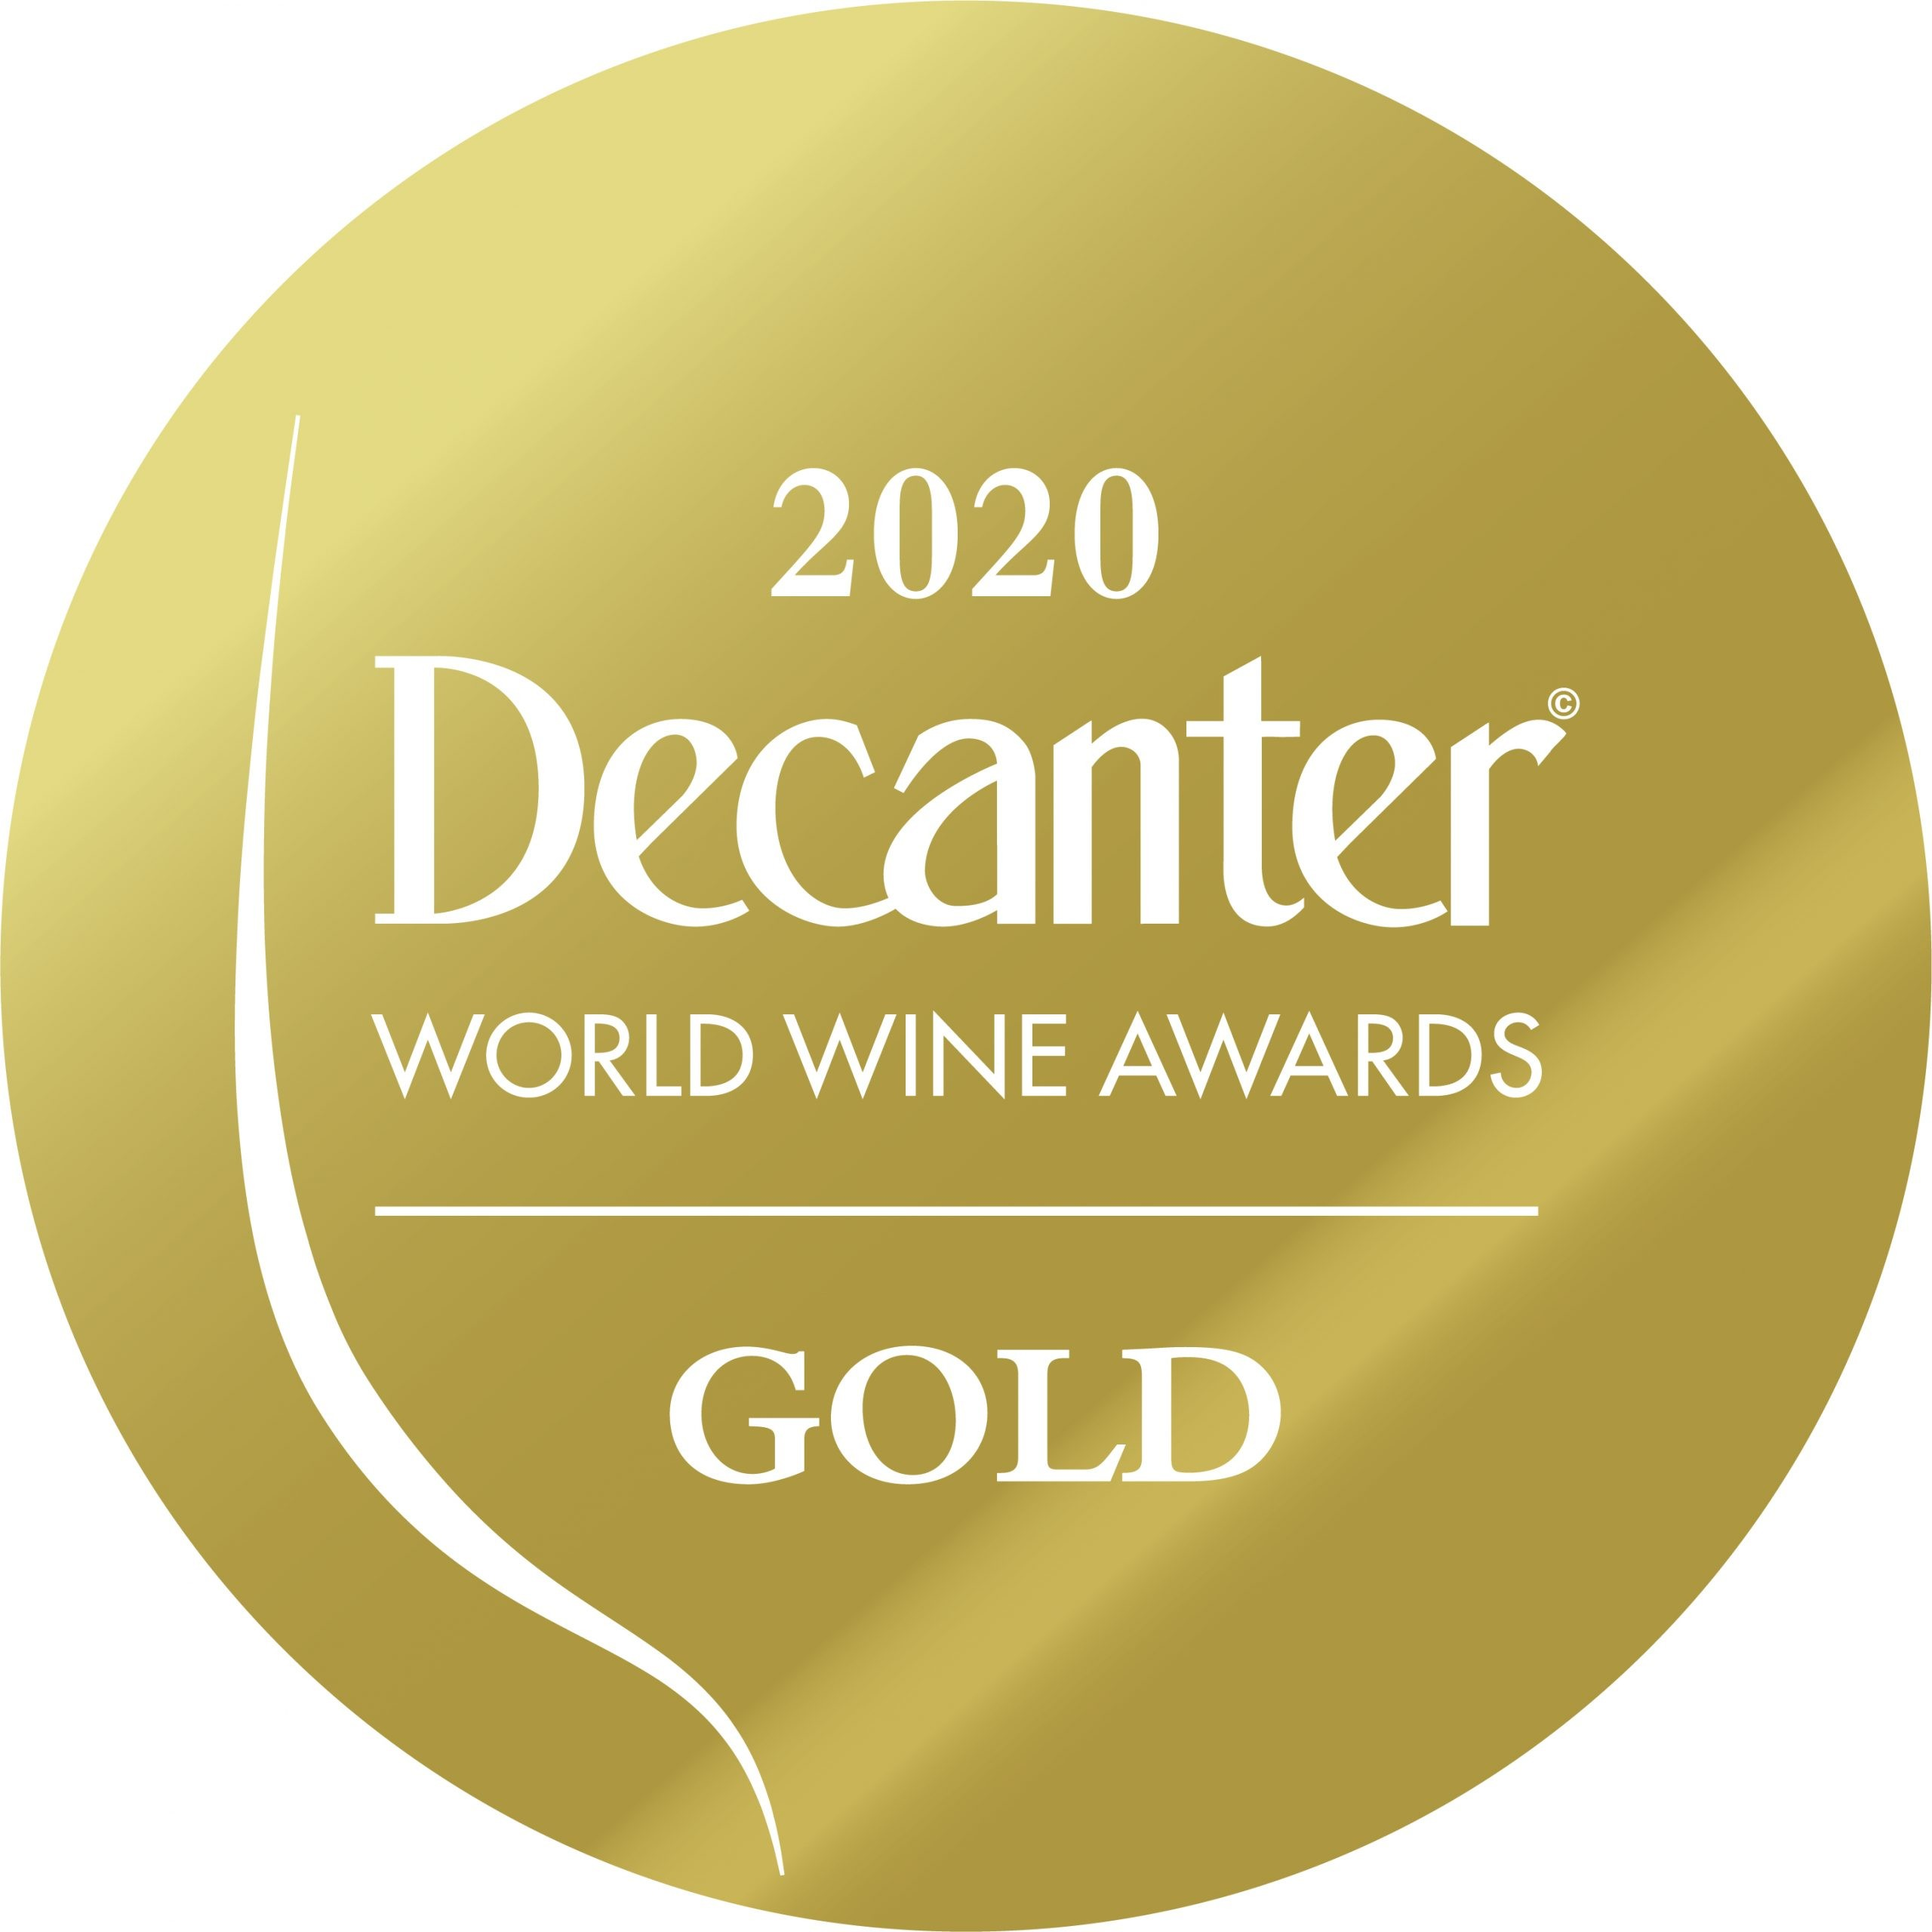 Médaille d'or 2020 au Concours Decanter World Wine Awards